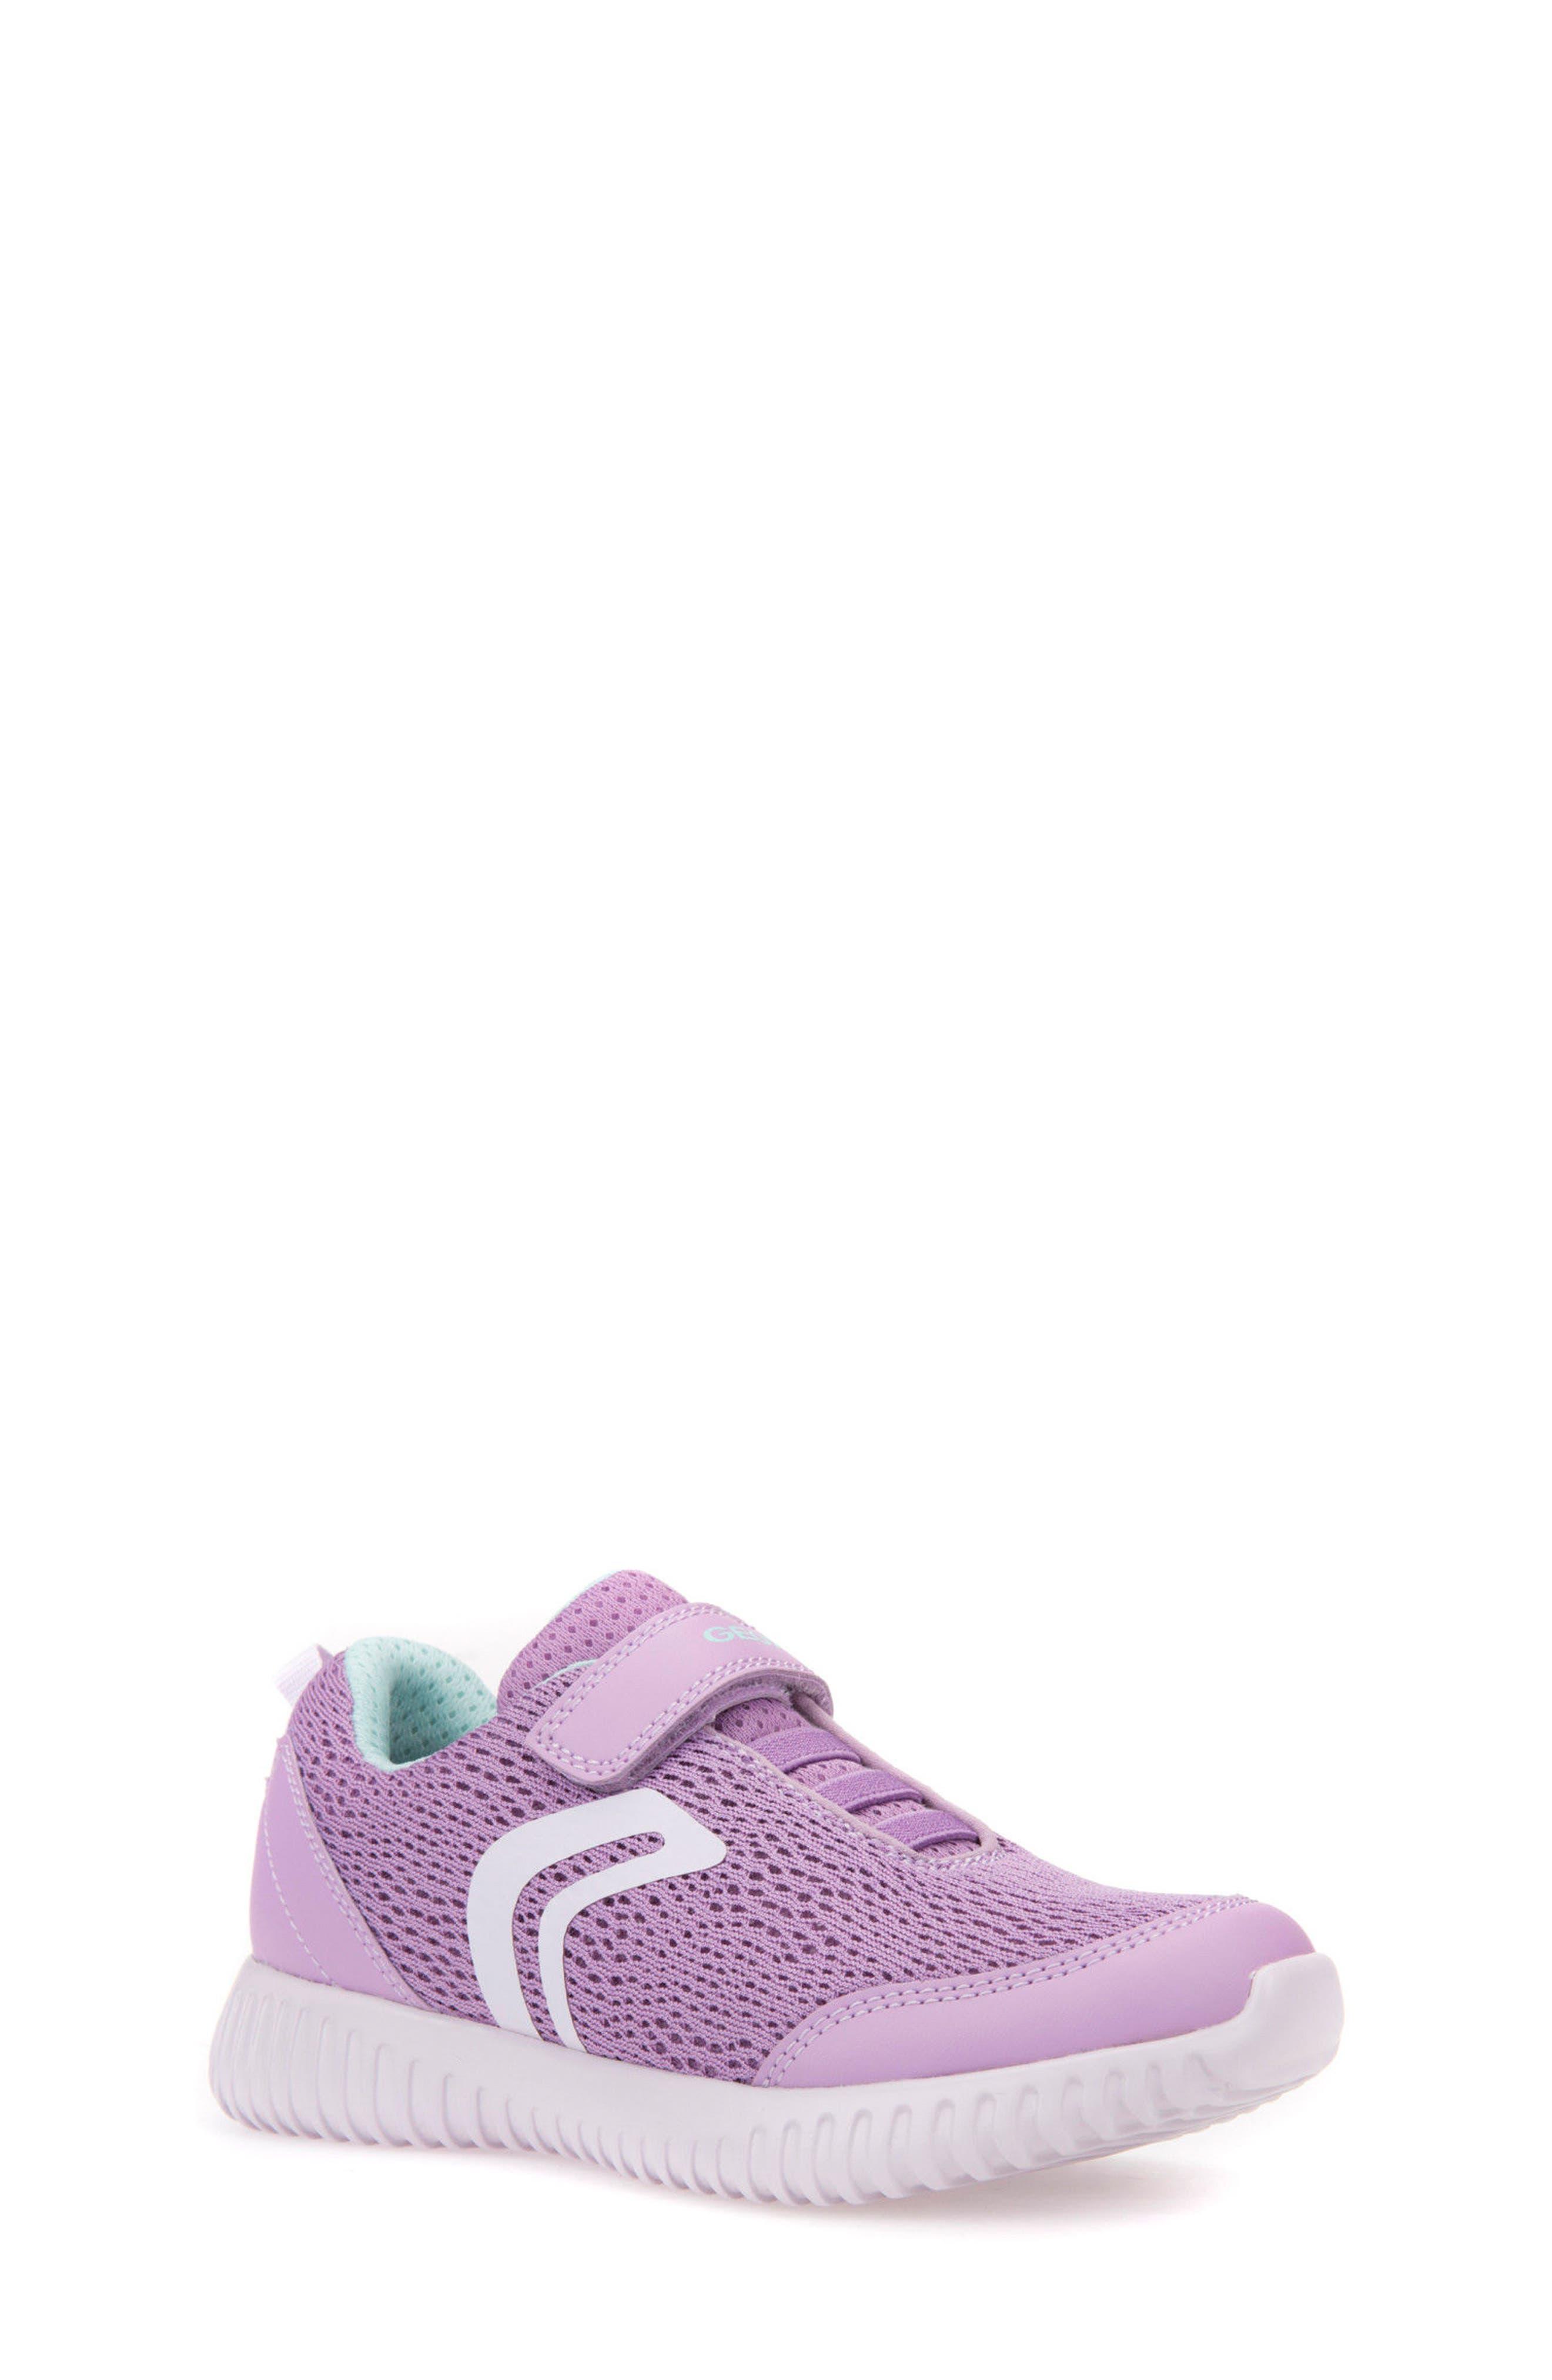 Waviness Sneaker,                             Main thumbnail 1, color,                             Lilac